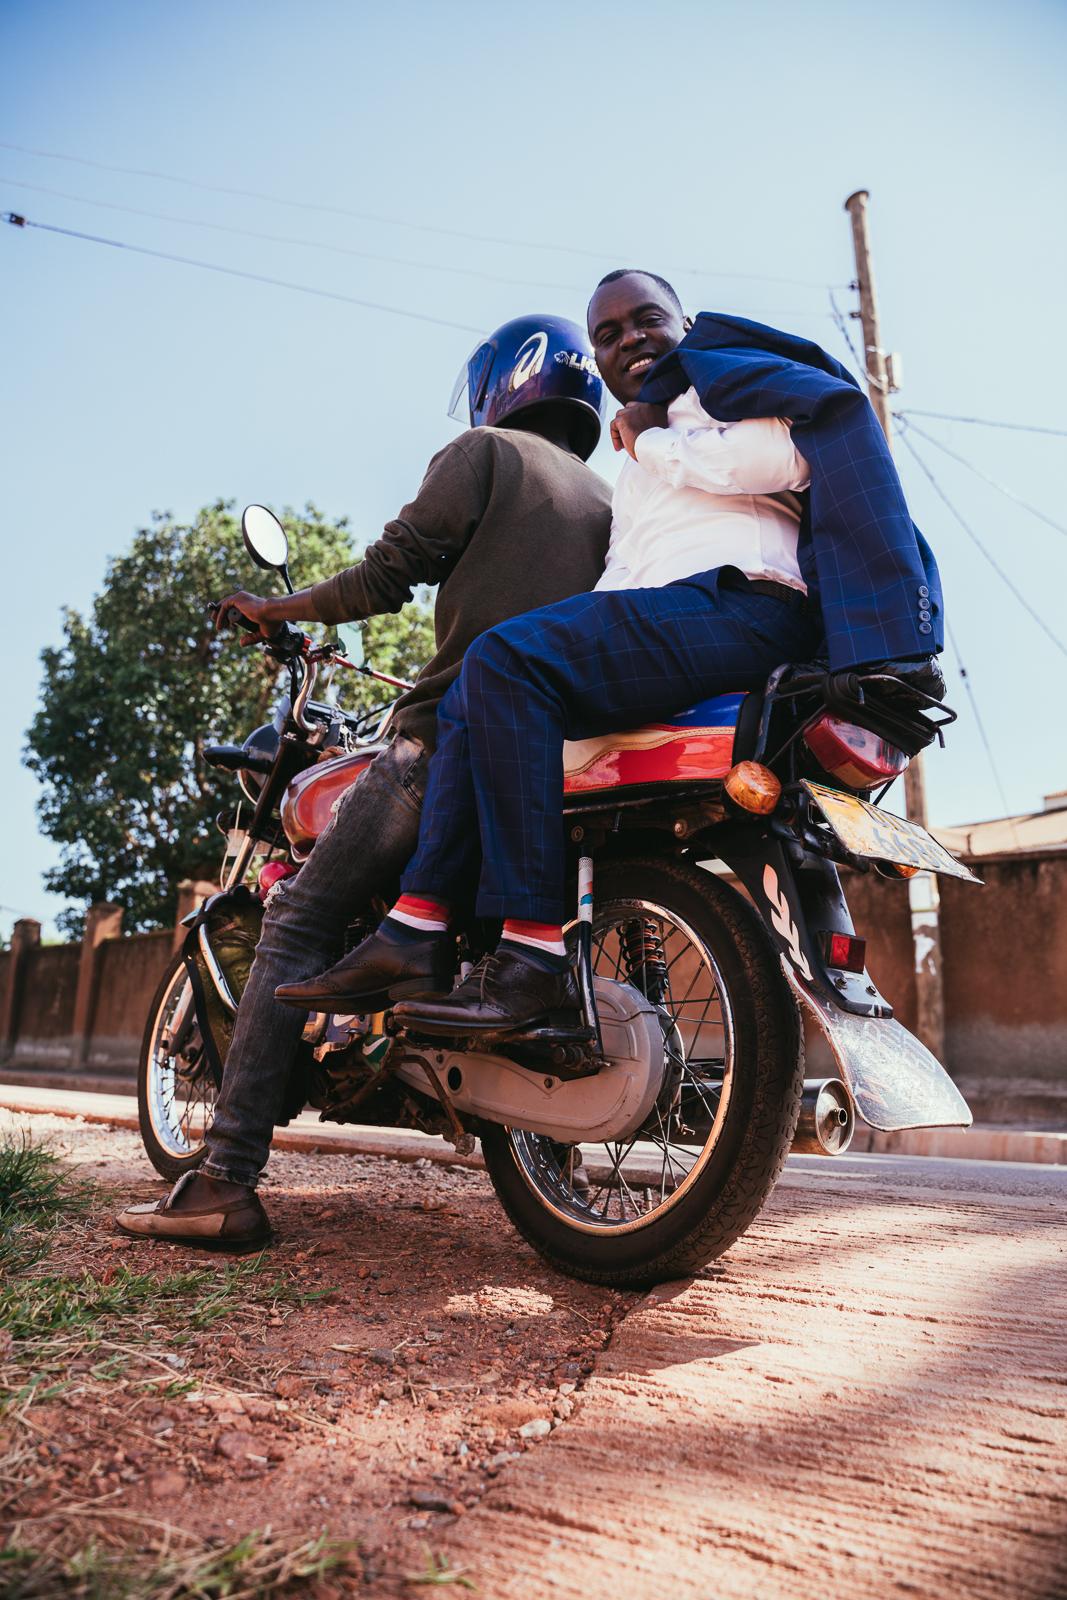 Queer_RebeccaRuetten_Uganda_Frank_web-08715.jpg